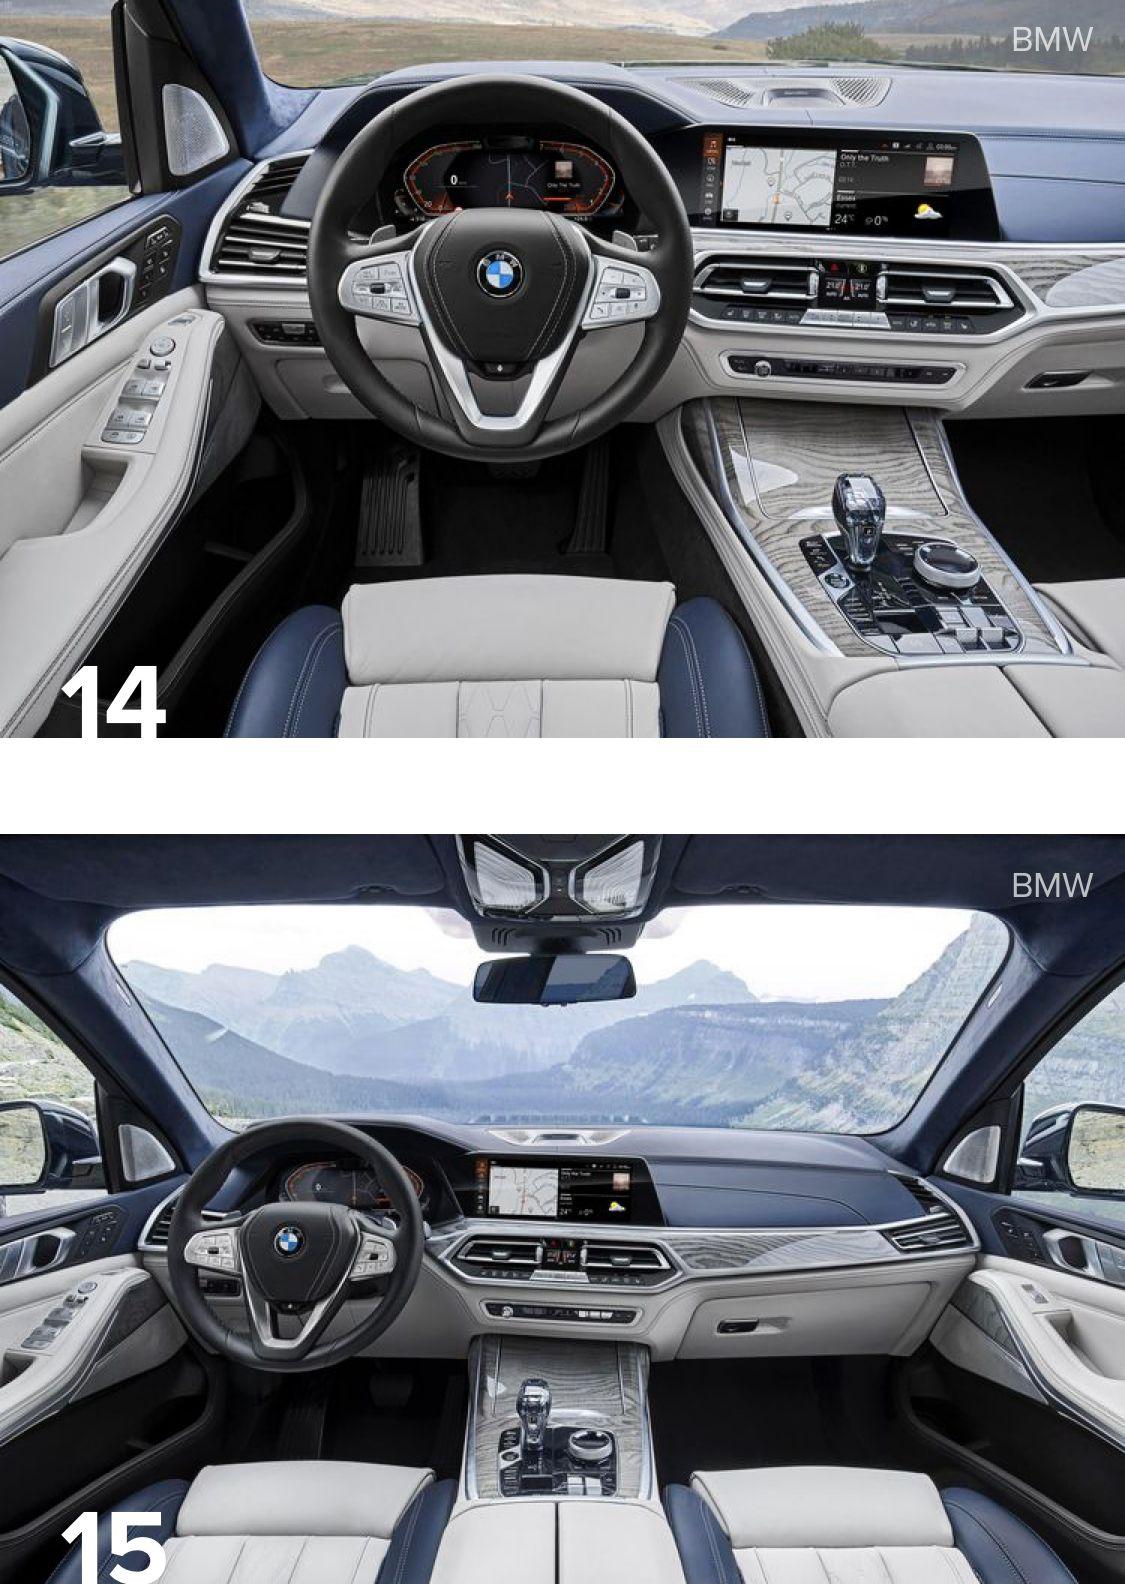 2019 Bmw X7 Xdrive40i Xdrive50i Riding In Opulence Bmw